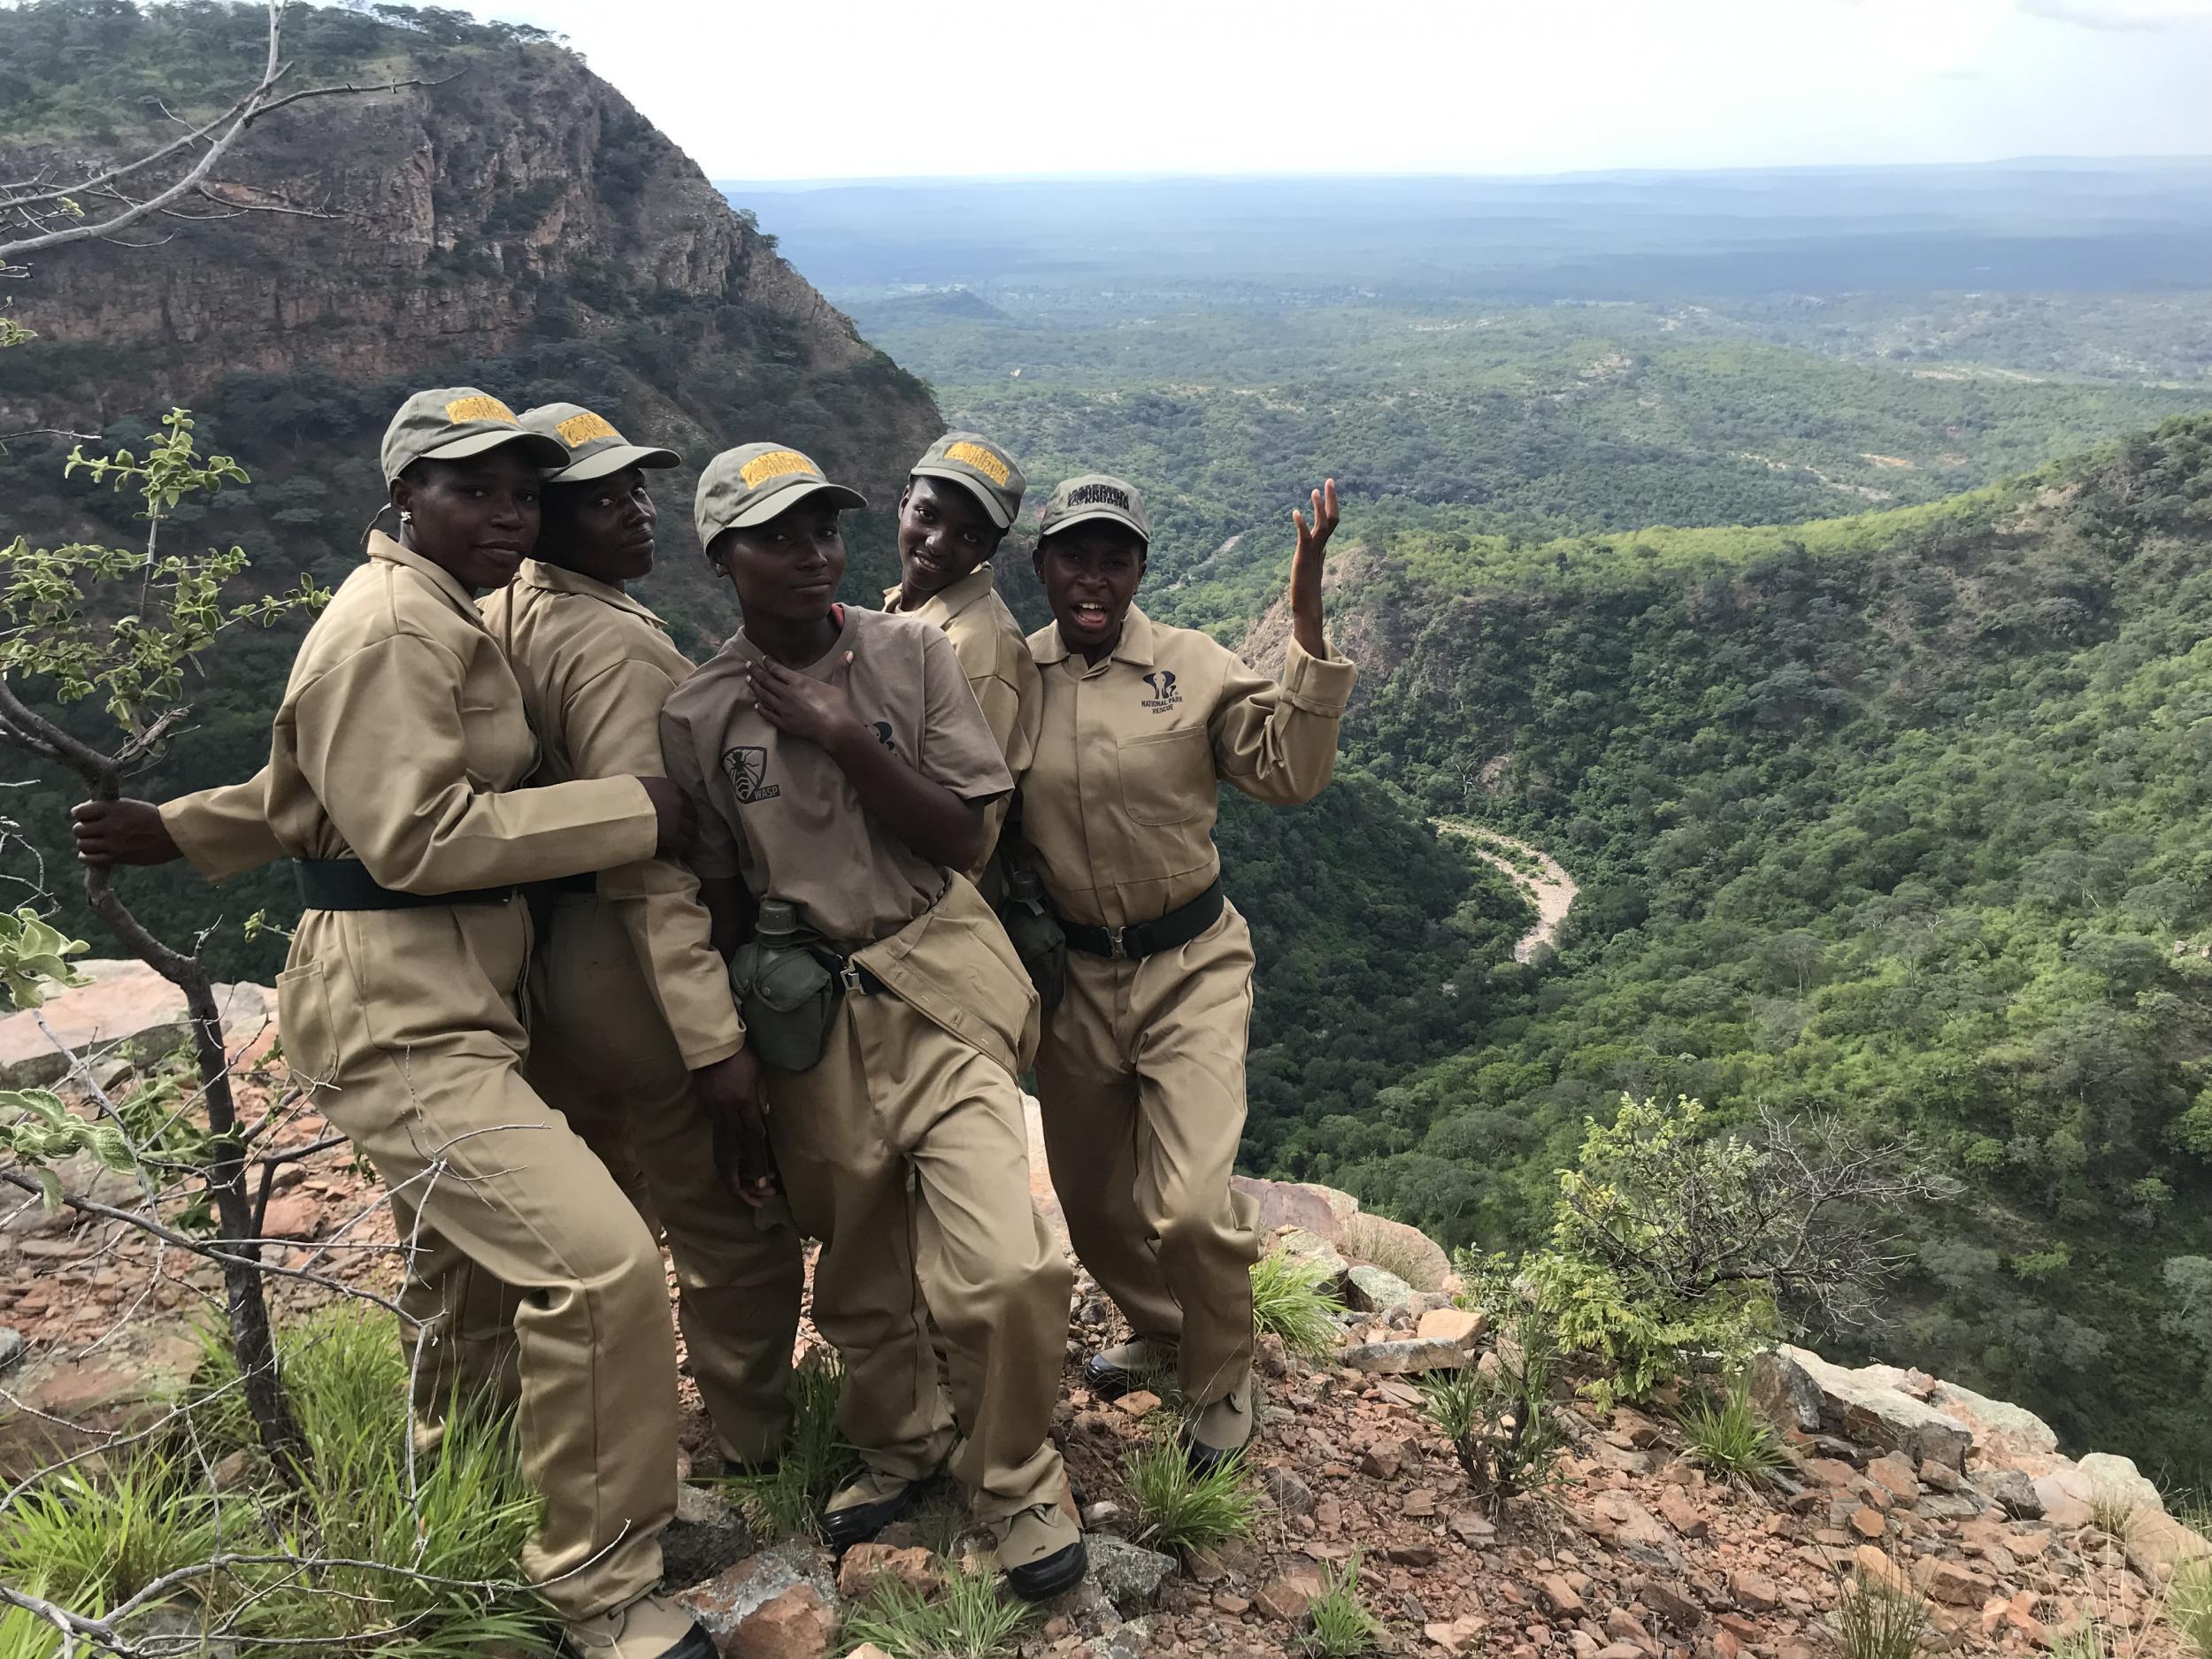 Disadvantaged single mothers trained to be a wildlife-saving squad in Zimbabwe photo